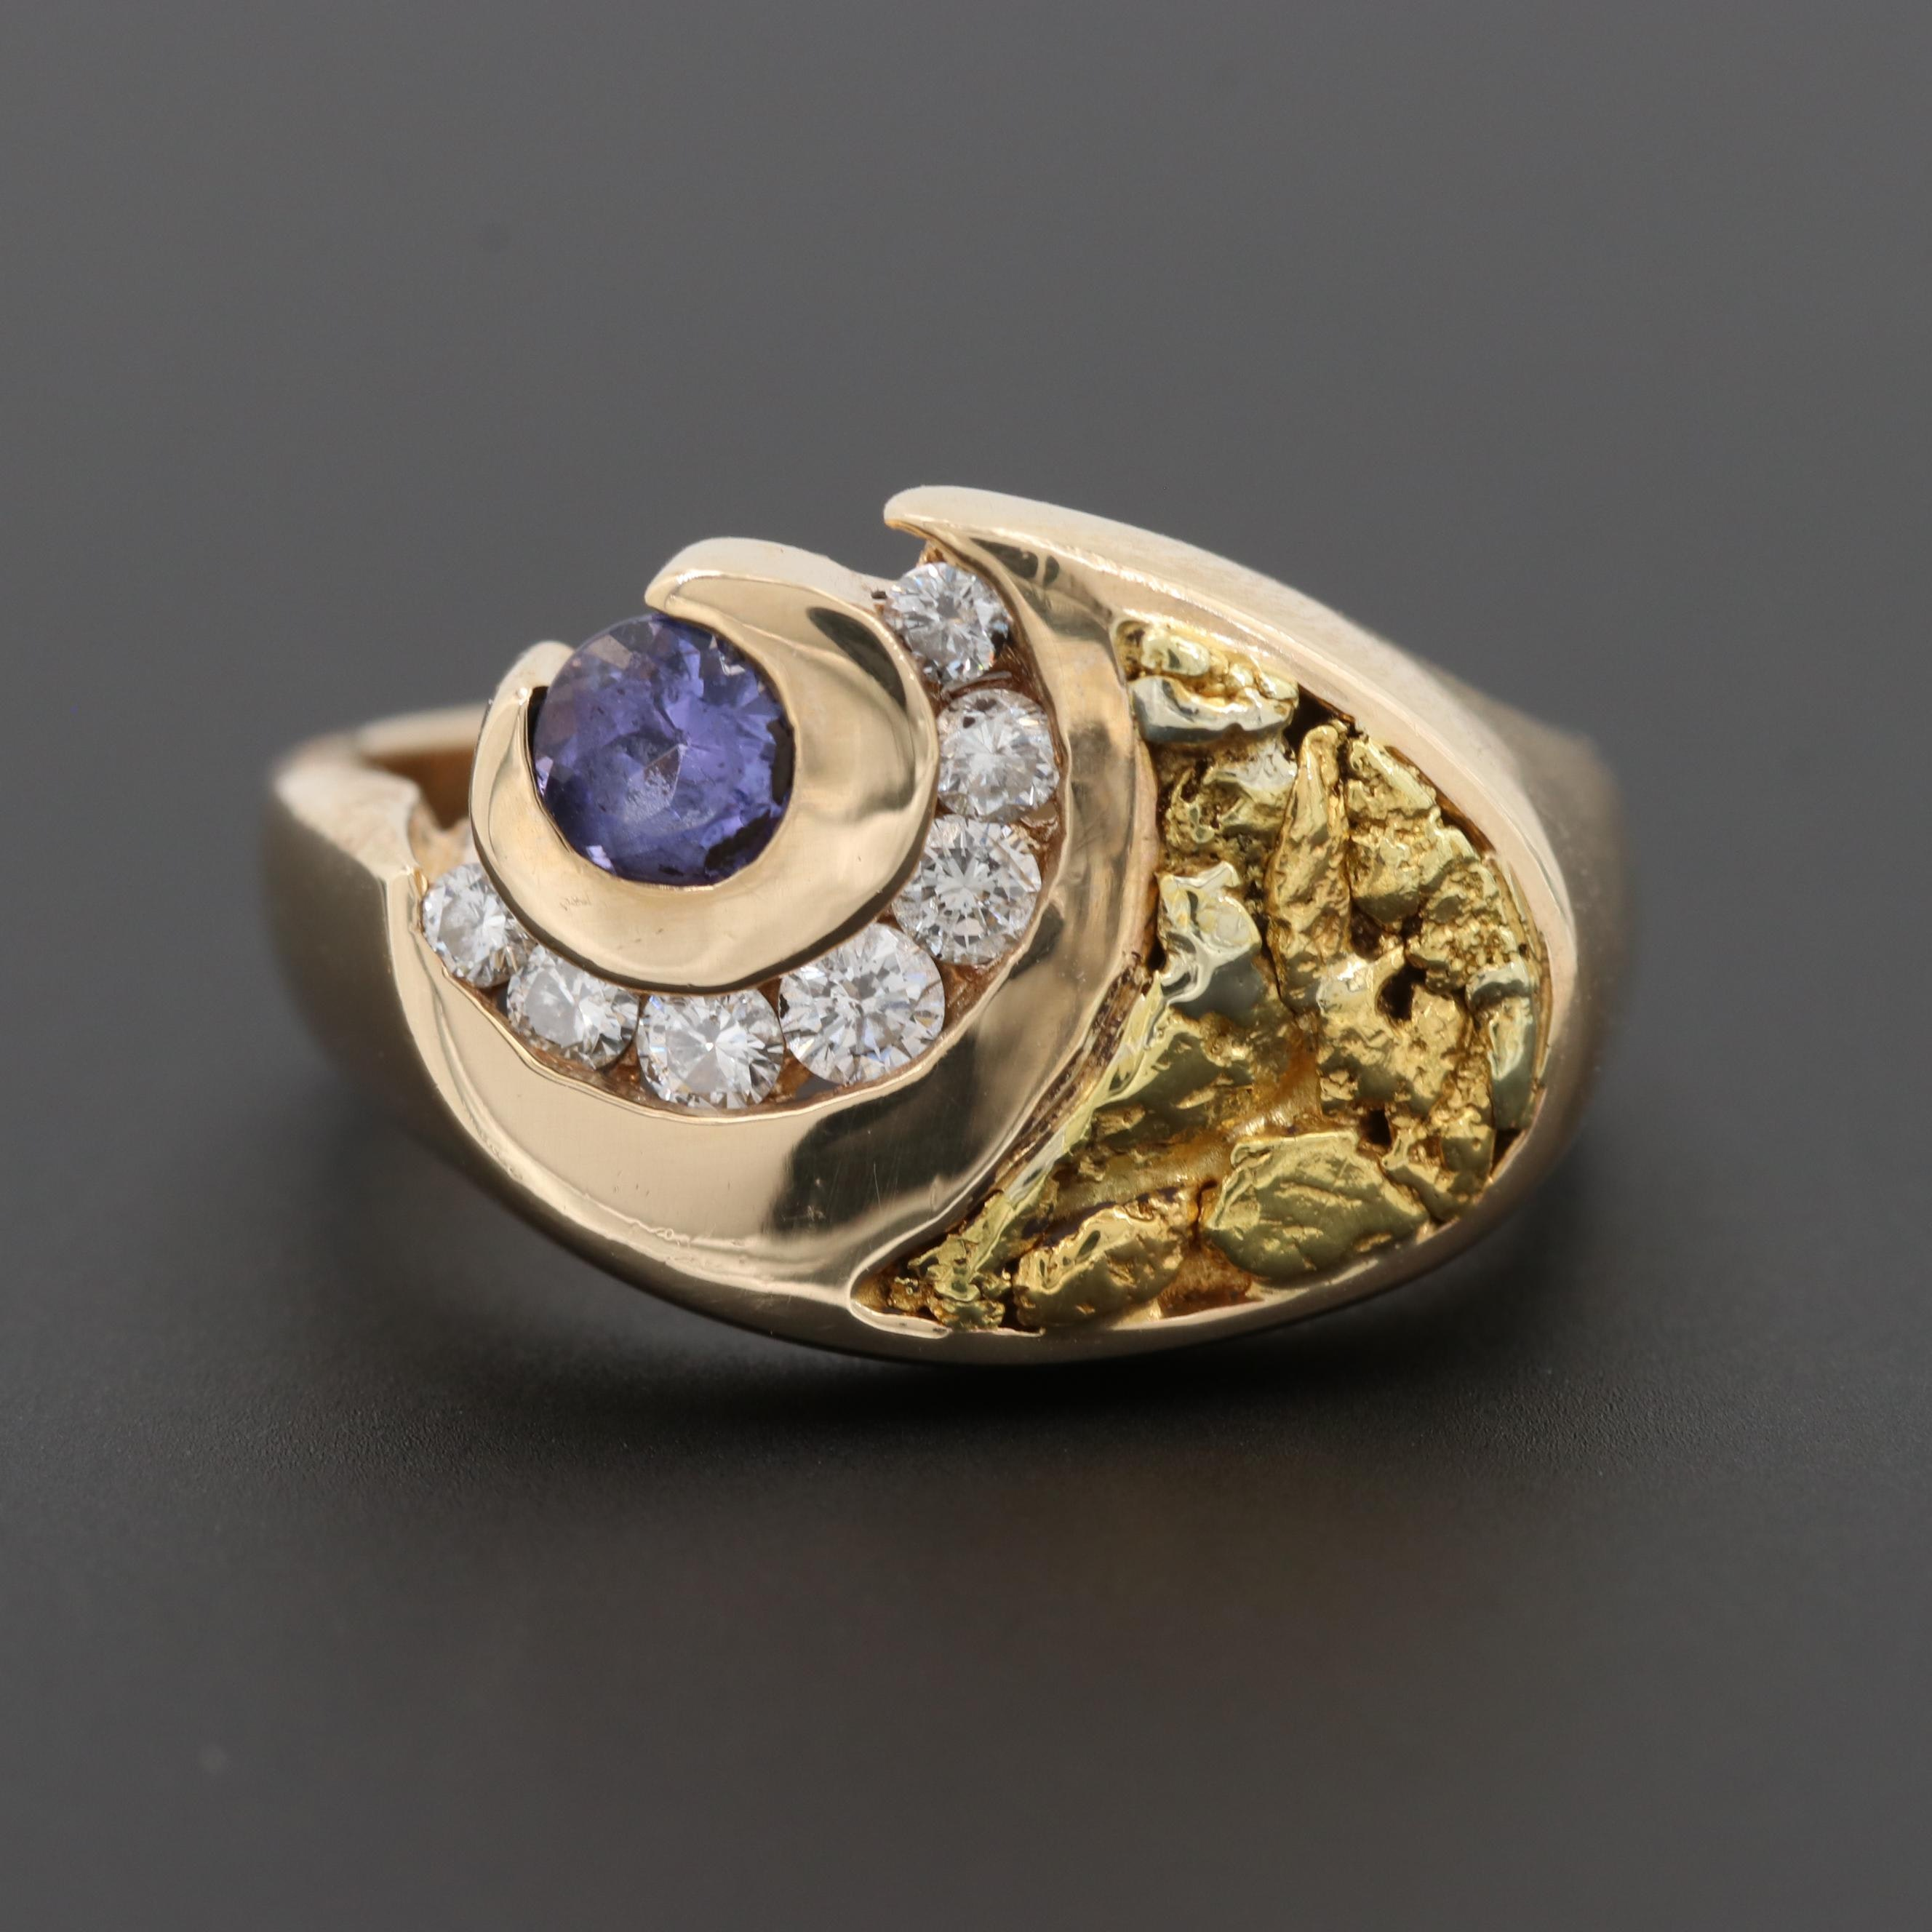 Vintage Kabana 14K Yellow Gold Tanzanite and Diamond Ring with 20K Nugget Inlay